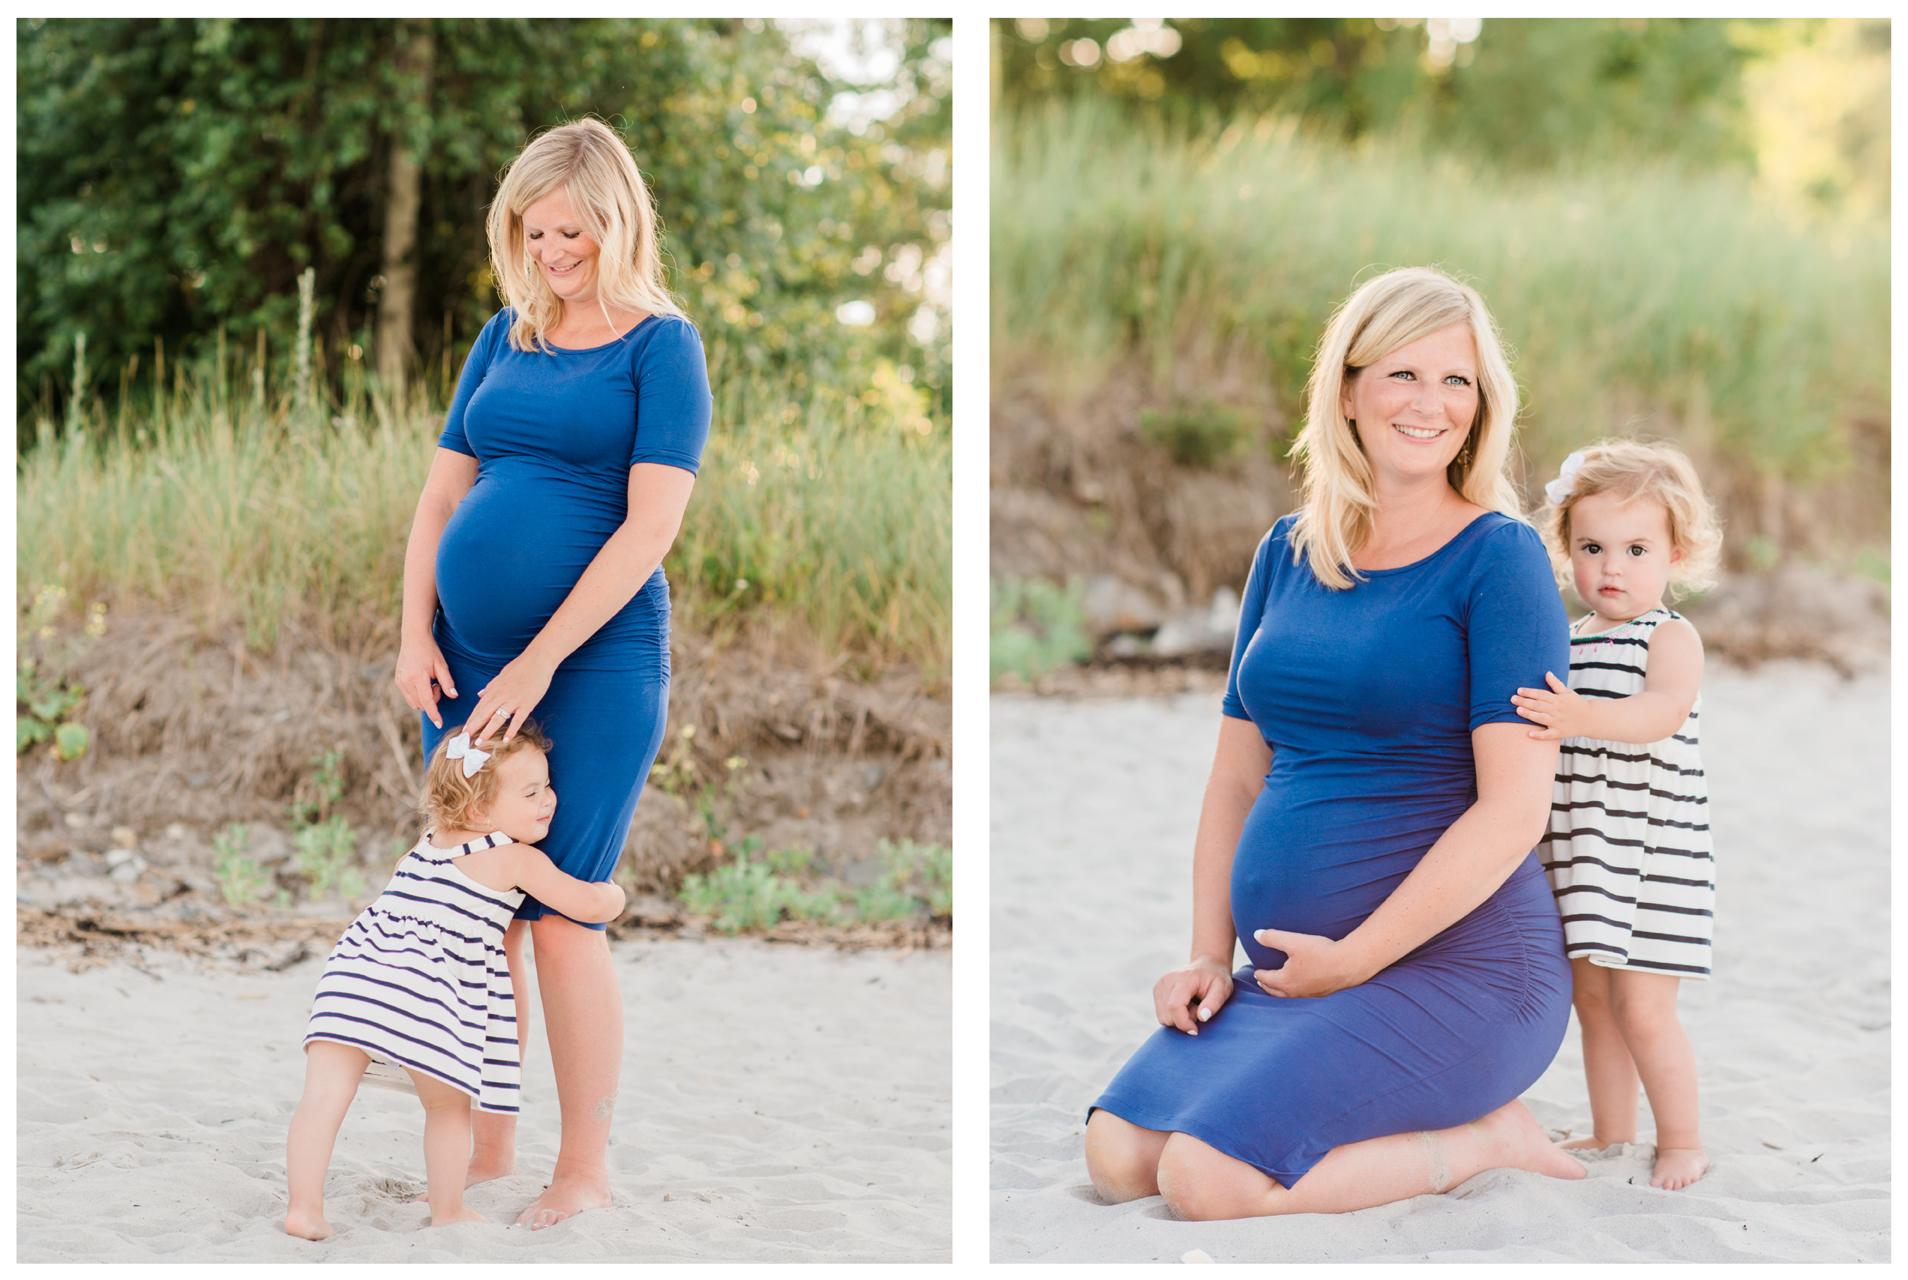 Maternity-Photographer-Sweet-Light-Portraits33.jpg